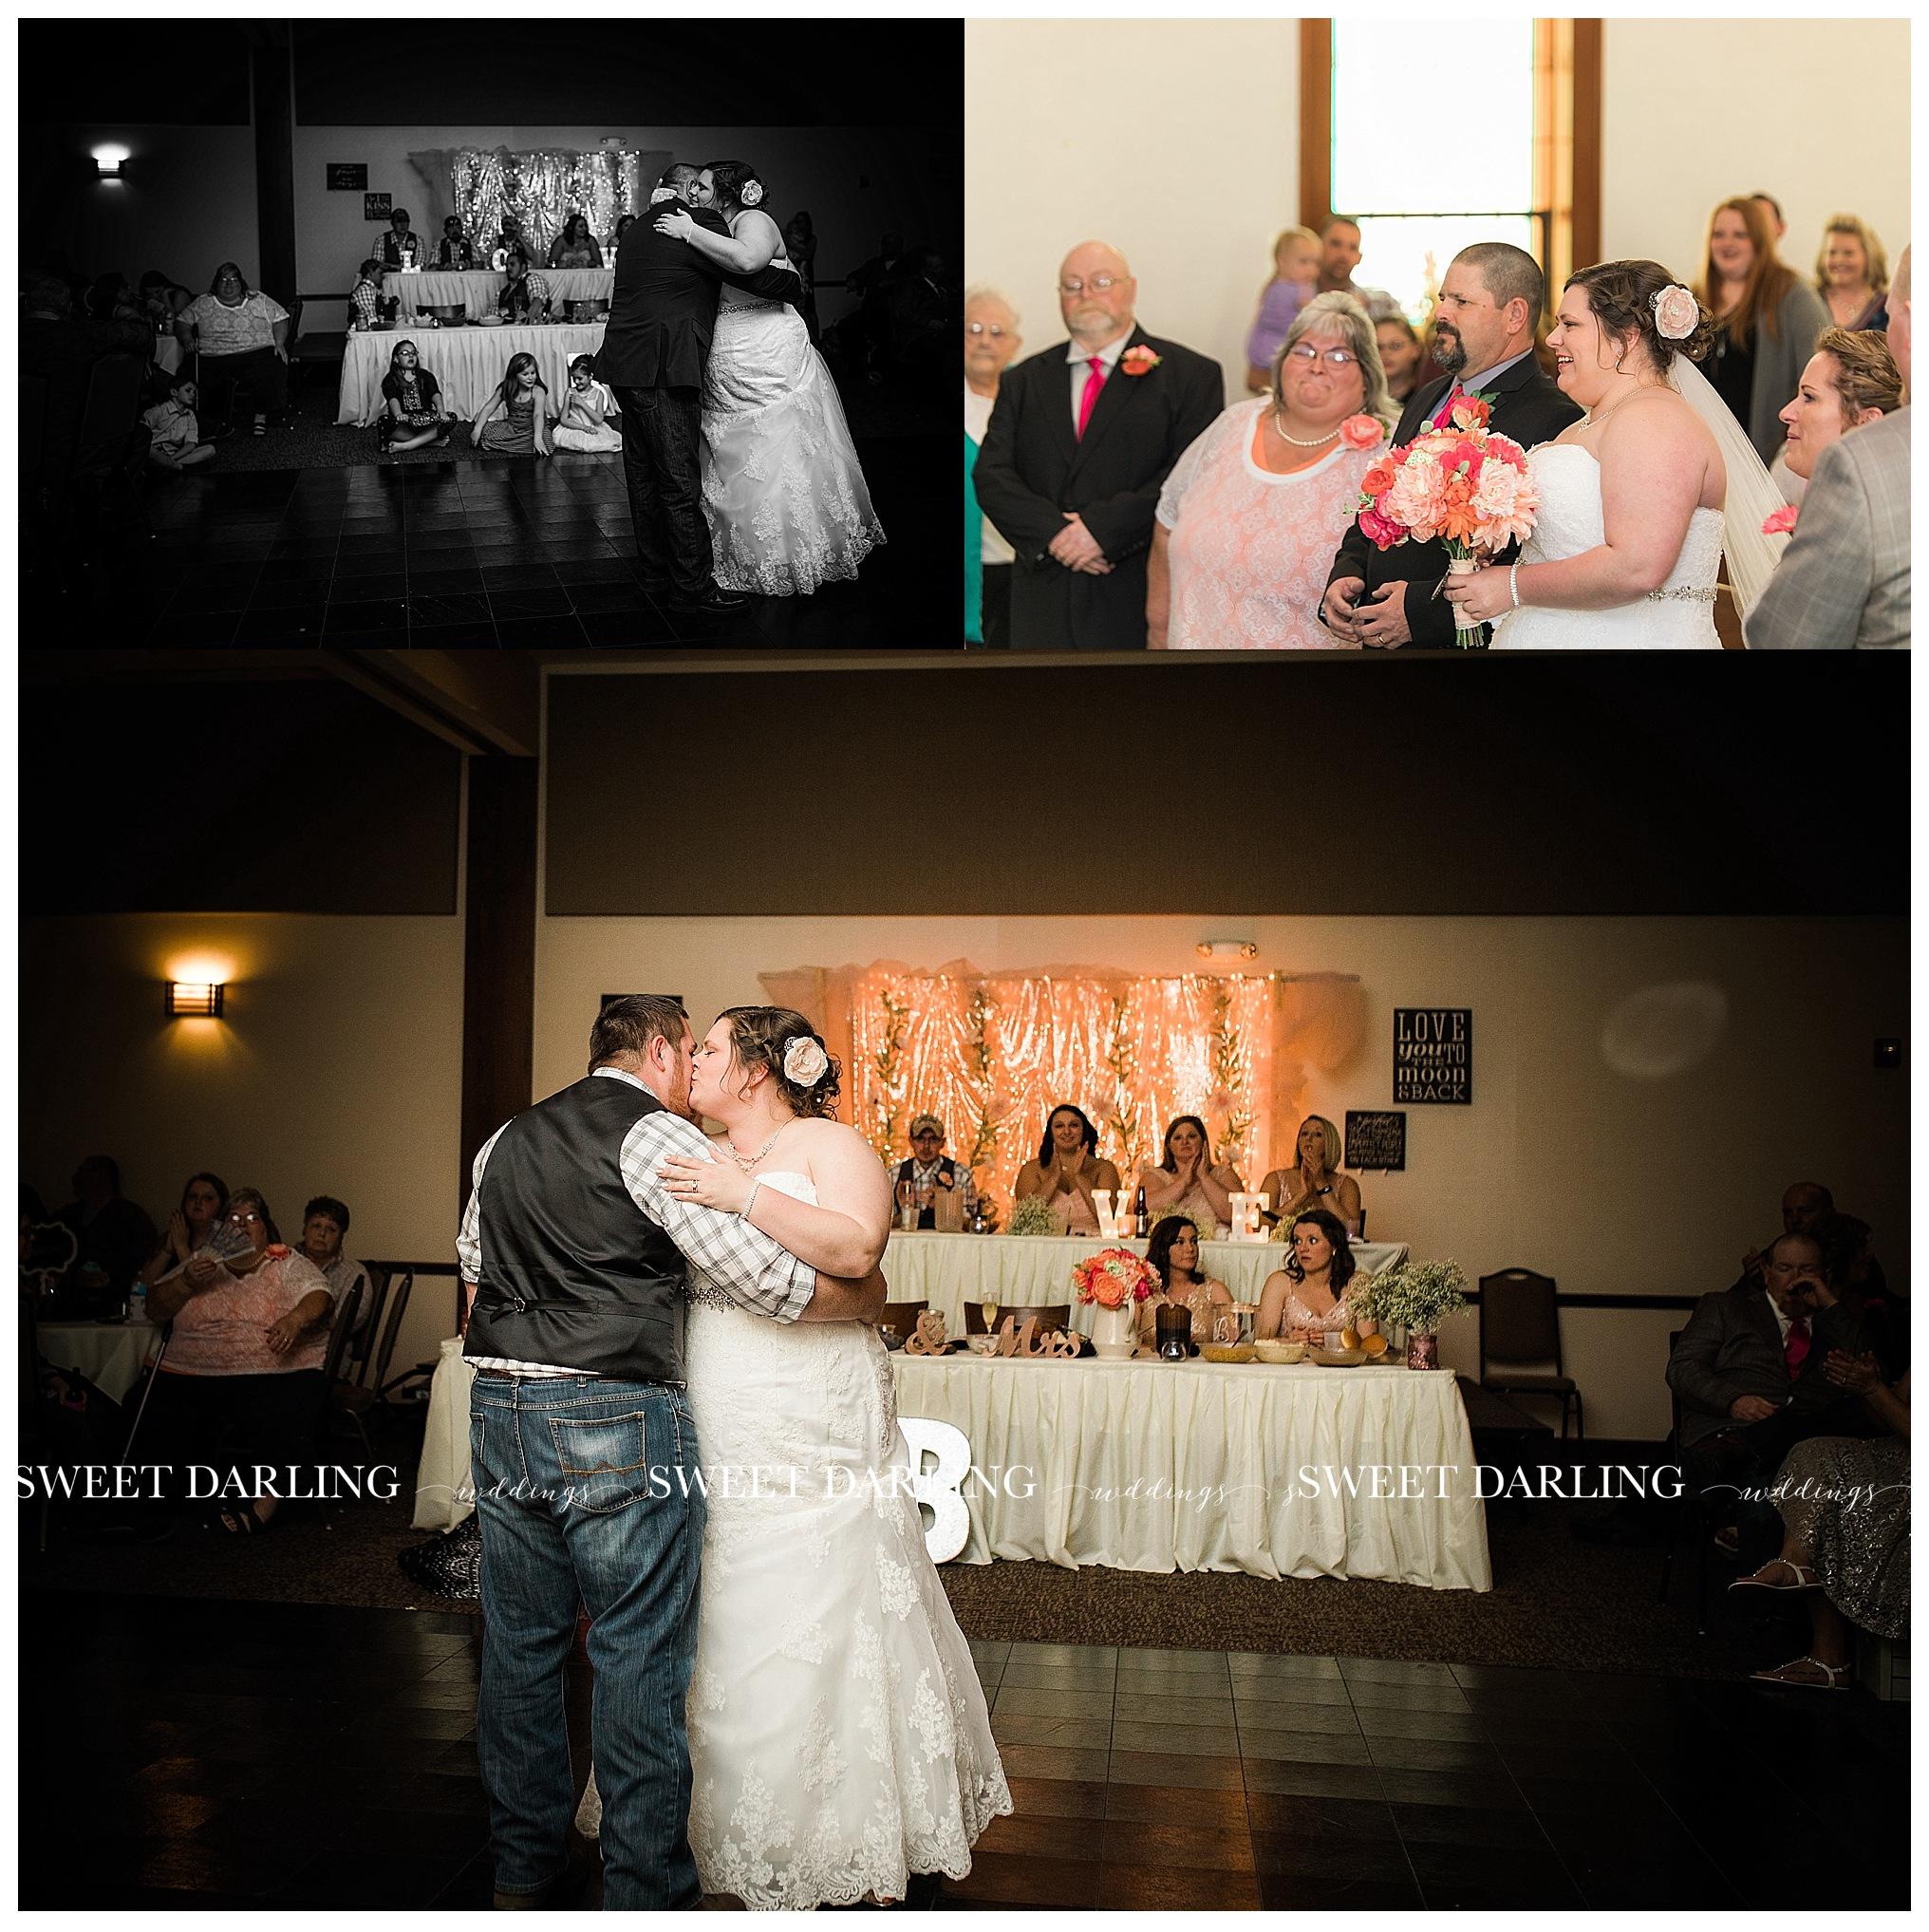 arcoloa-illinois-coles-county-wedding-photography-sweet-darling-weddings-photographer_0957.jpg